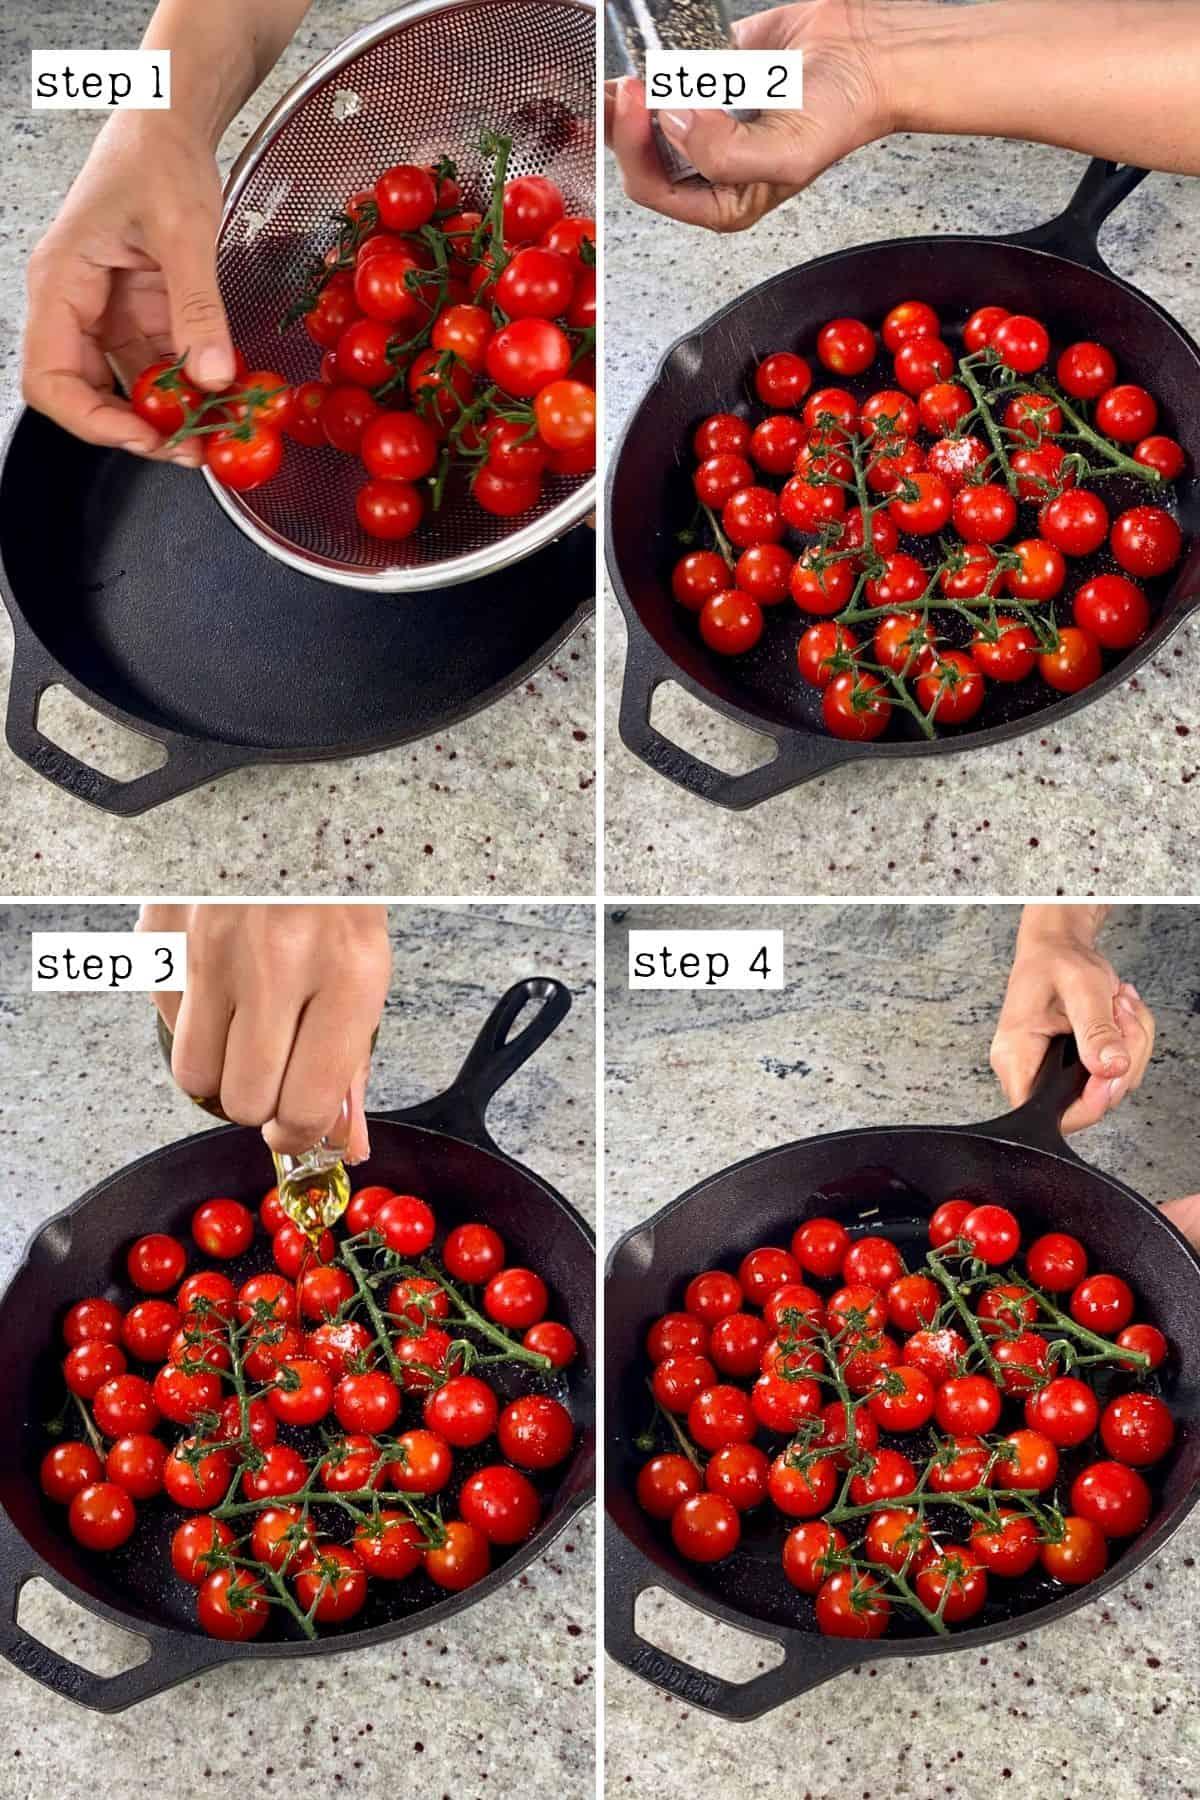 Steps for preparing tomatoes